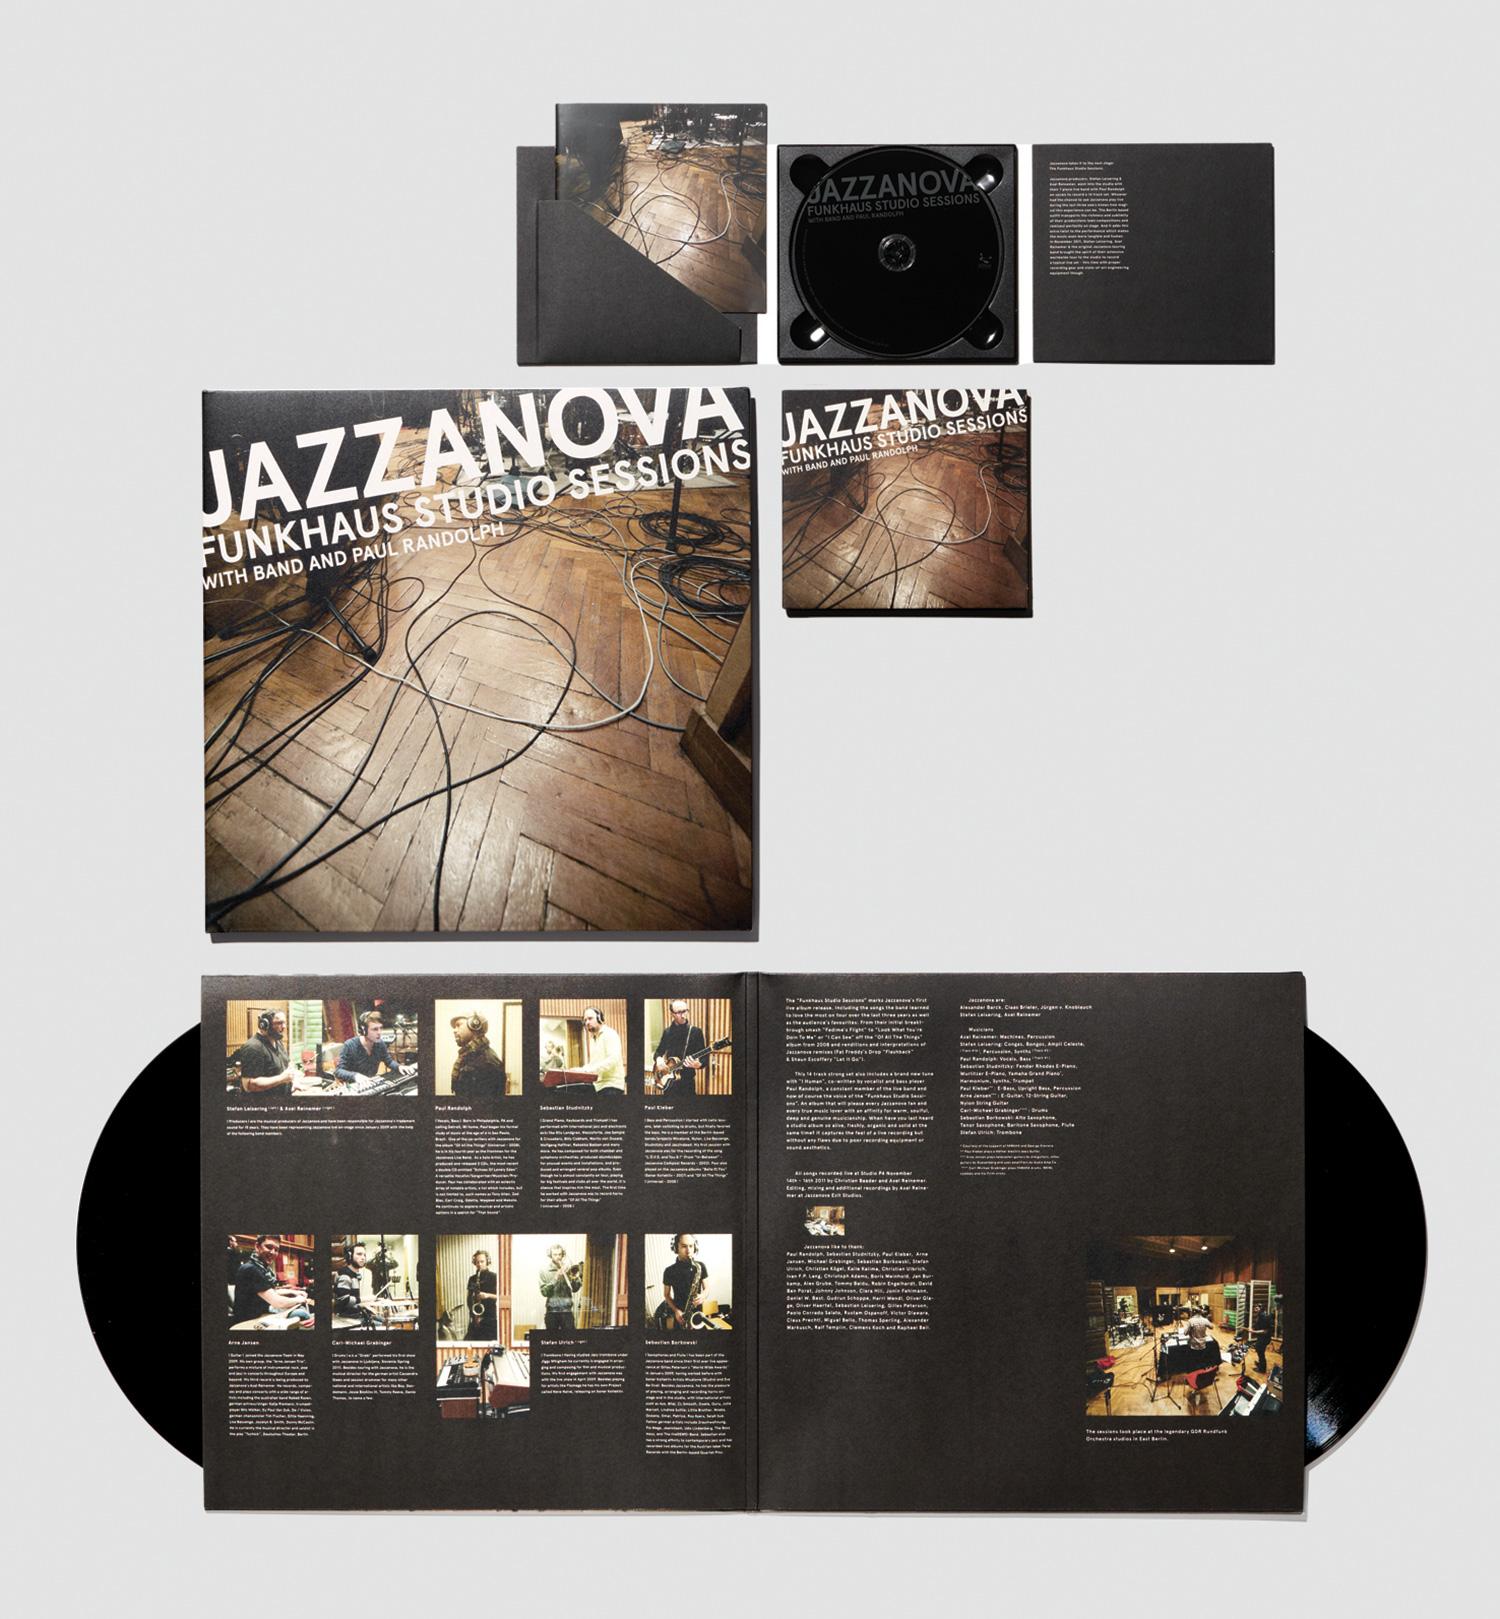 Jazzanova_album_bearb